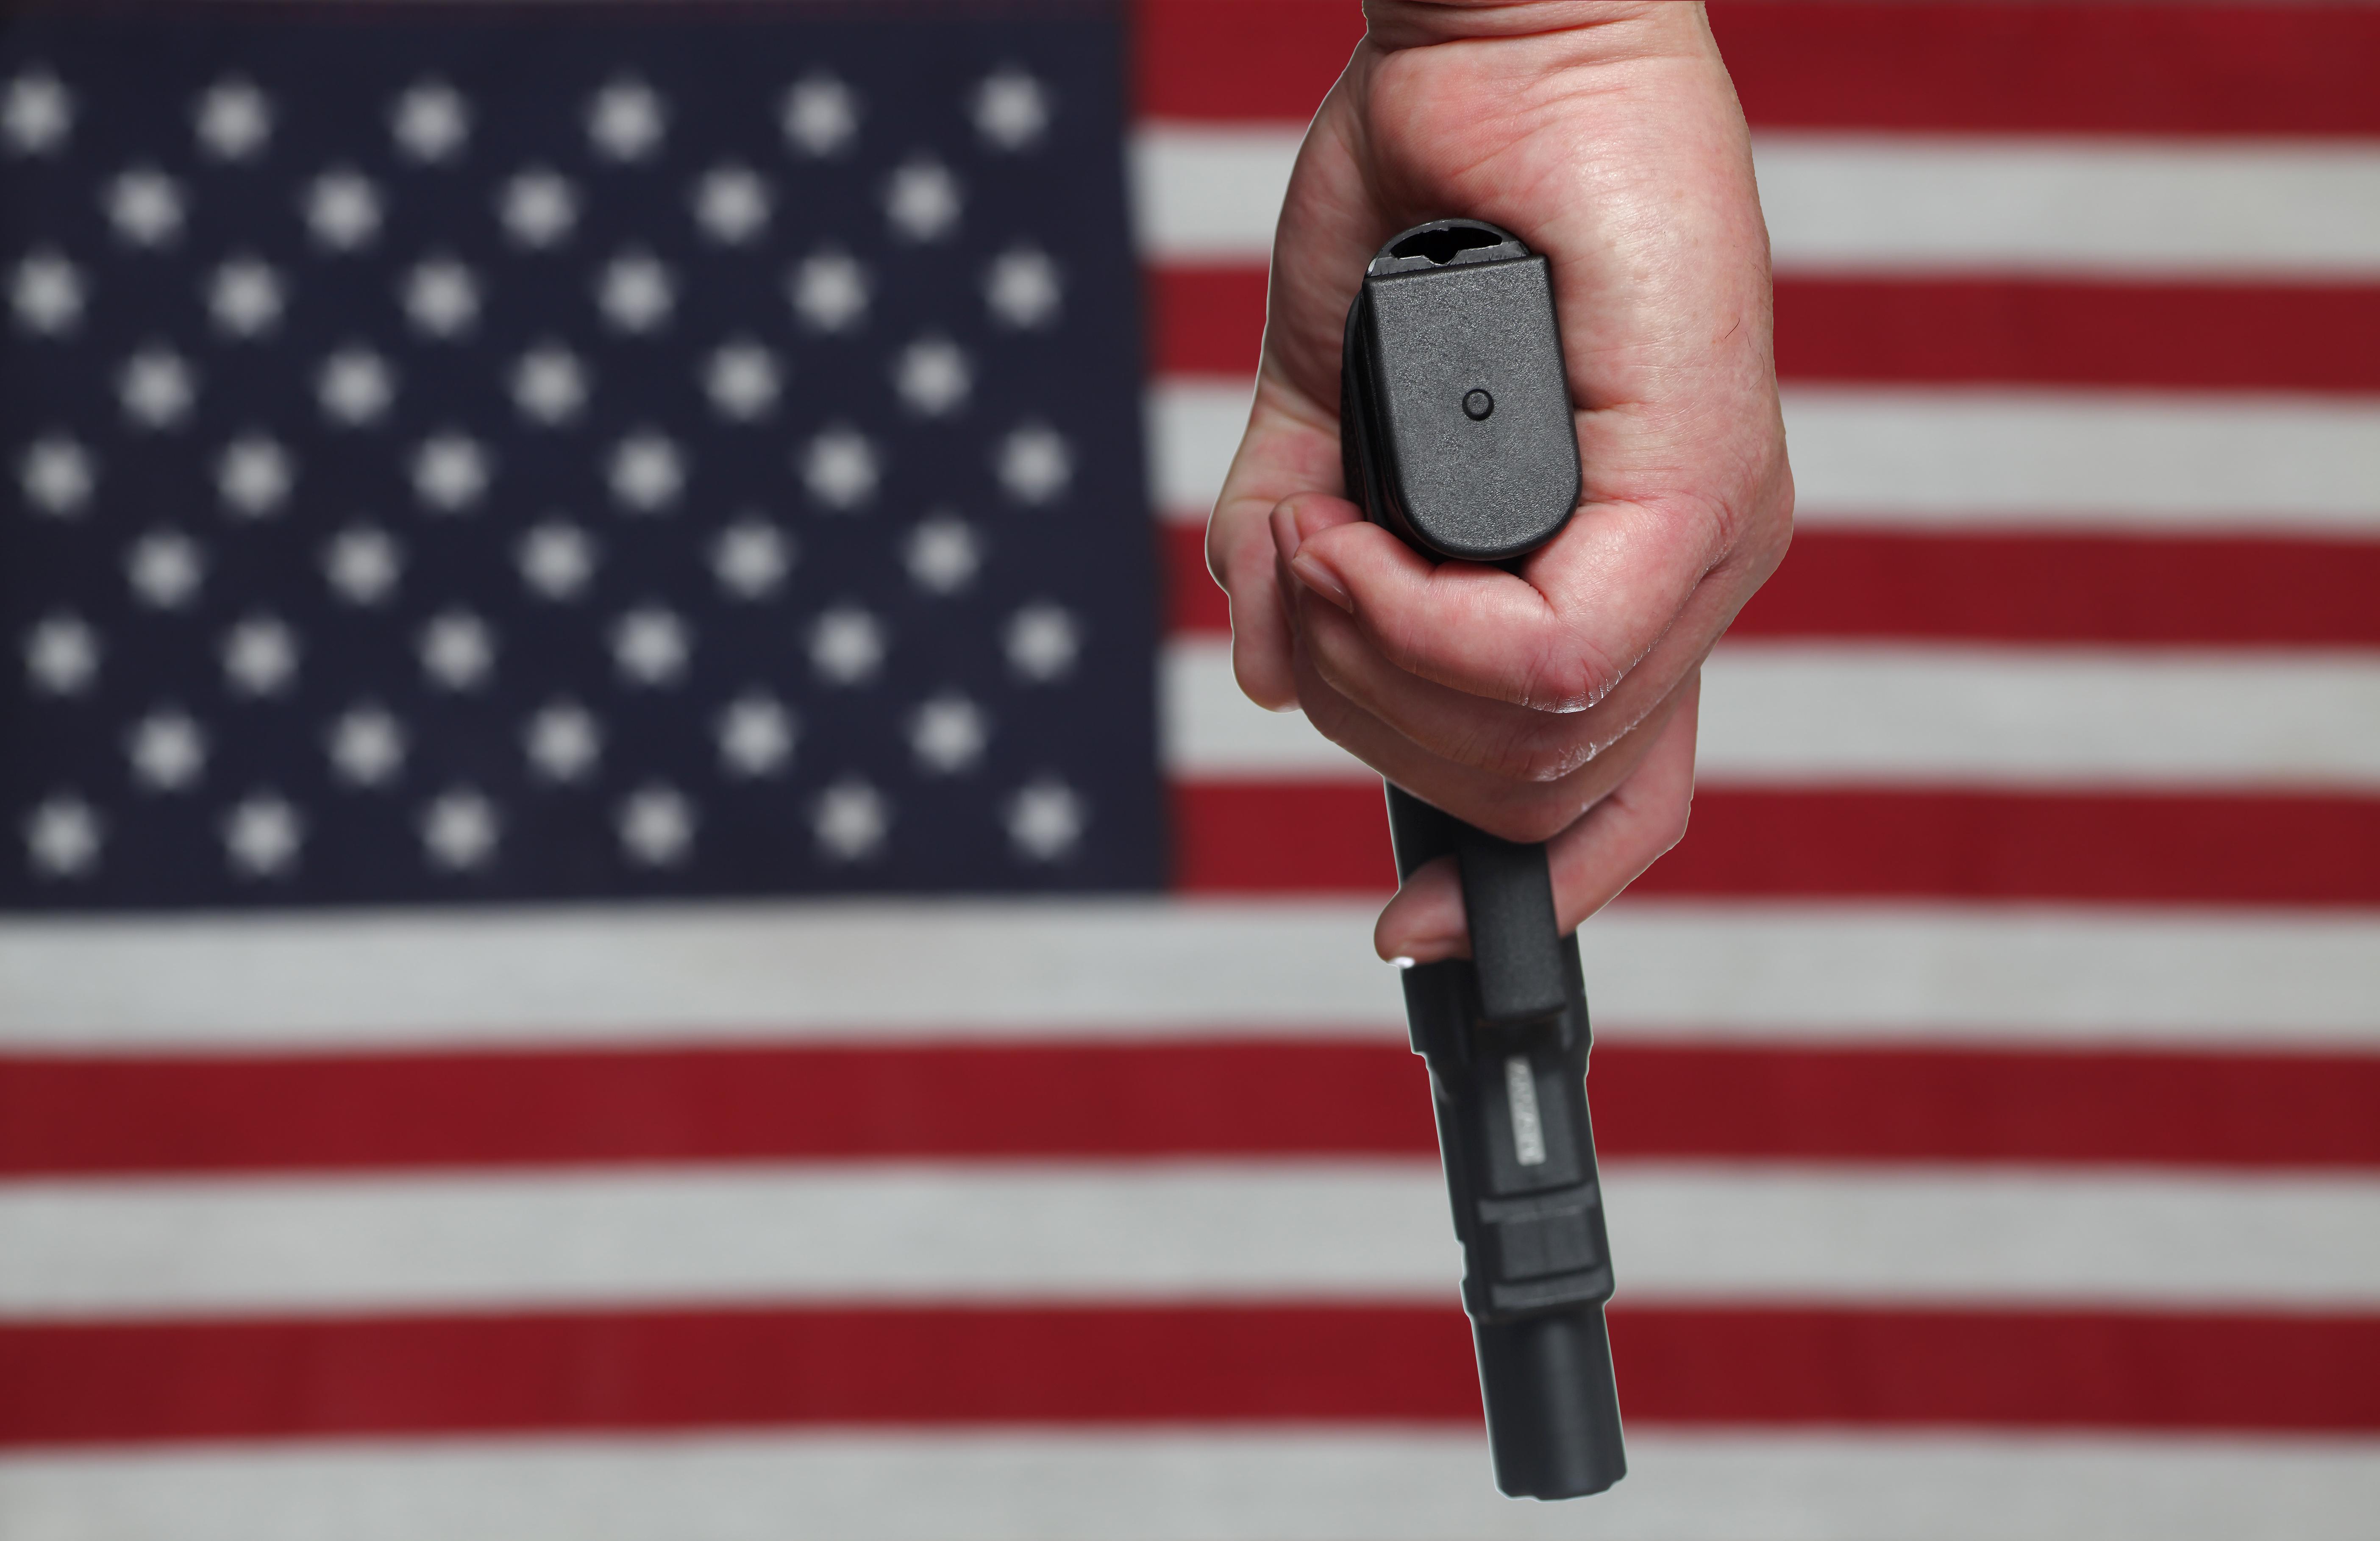 The case against arming teachers with guns - Vox